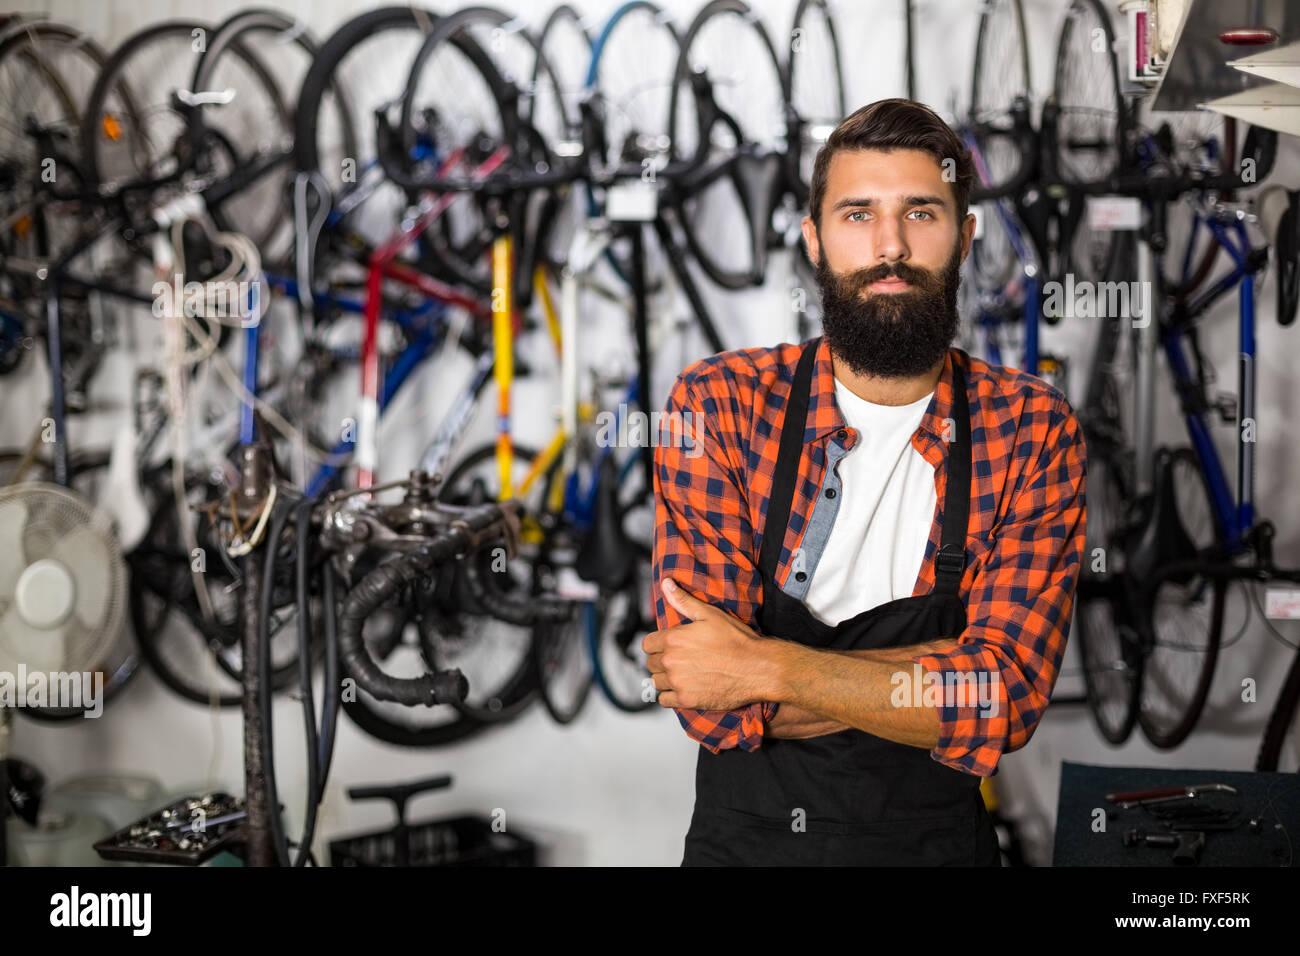 Fahrrad Mechaniker stehend mit Arme gekreuzt Stockbild